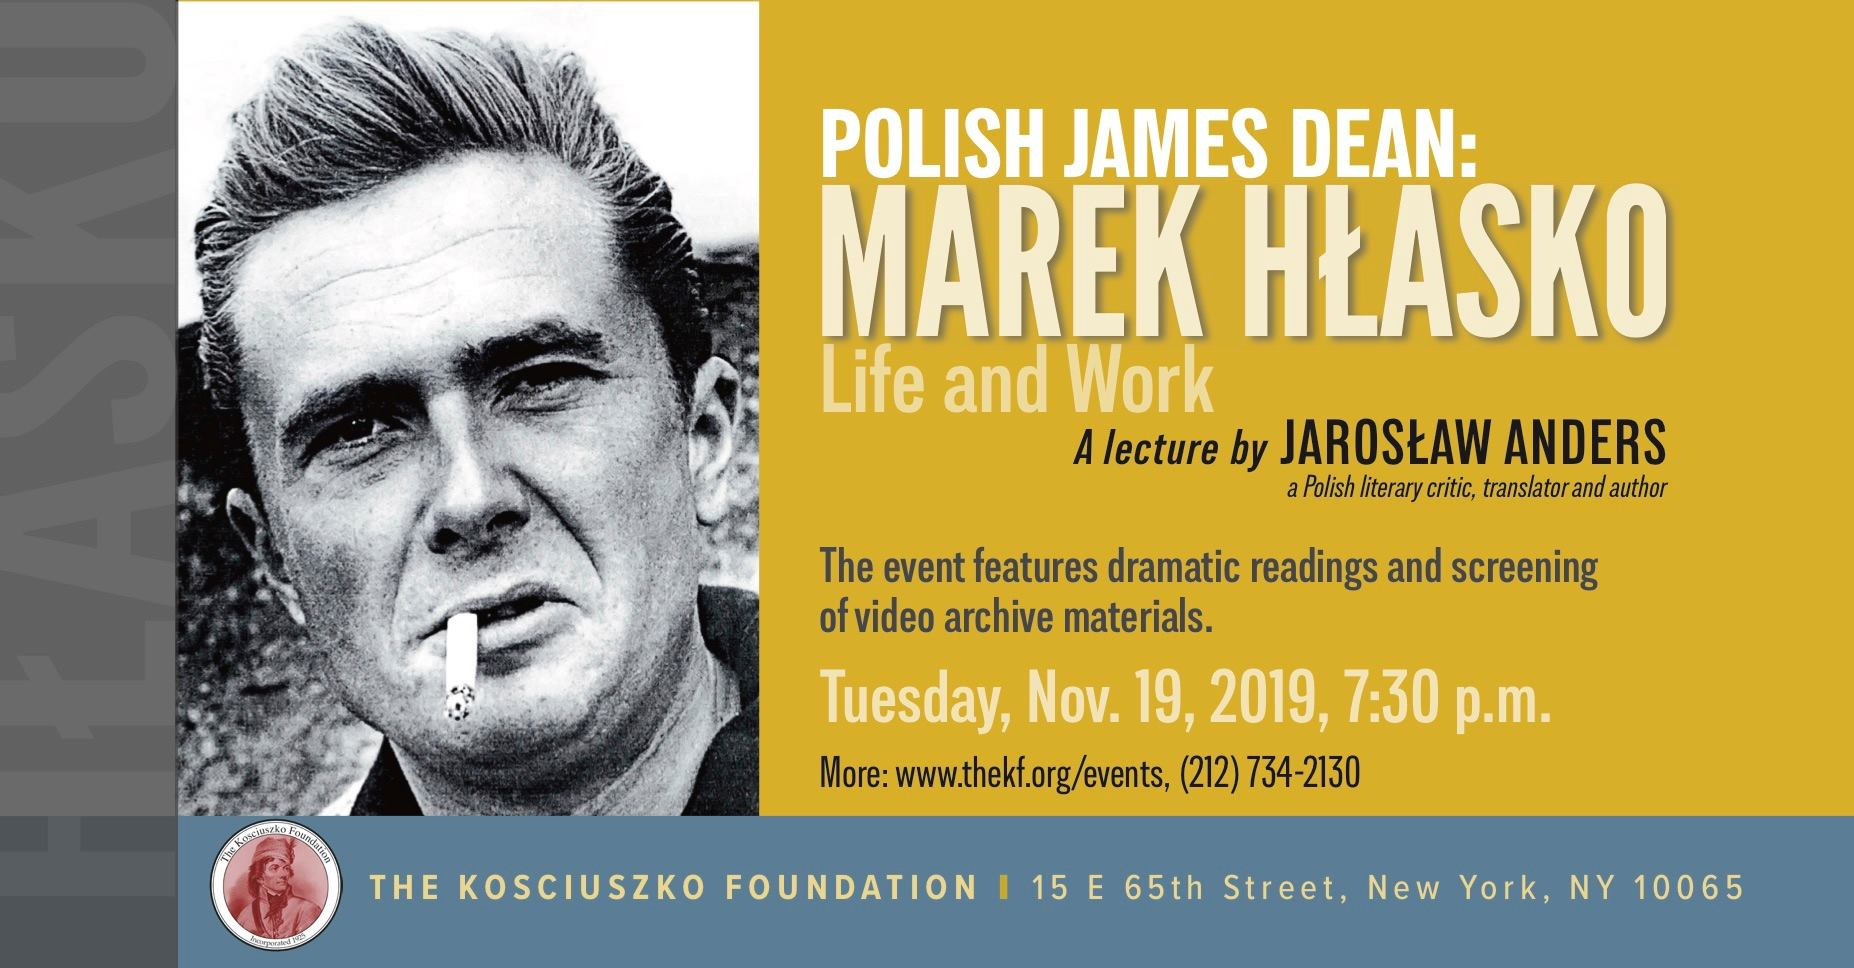 Polish James Dean: Marek Hlasko - Life and Work at The Kosciuszko Foundation